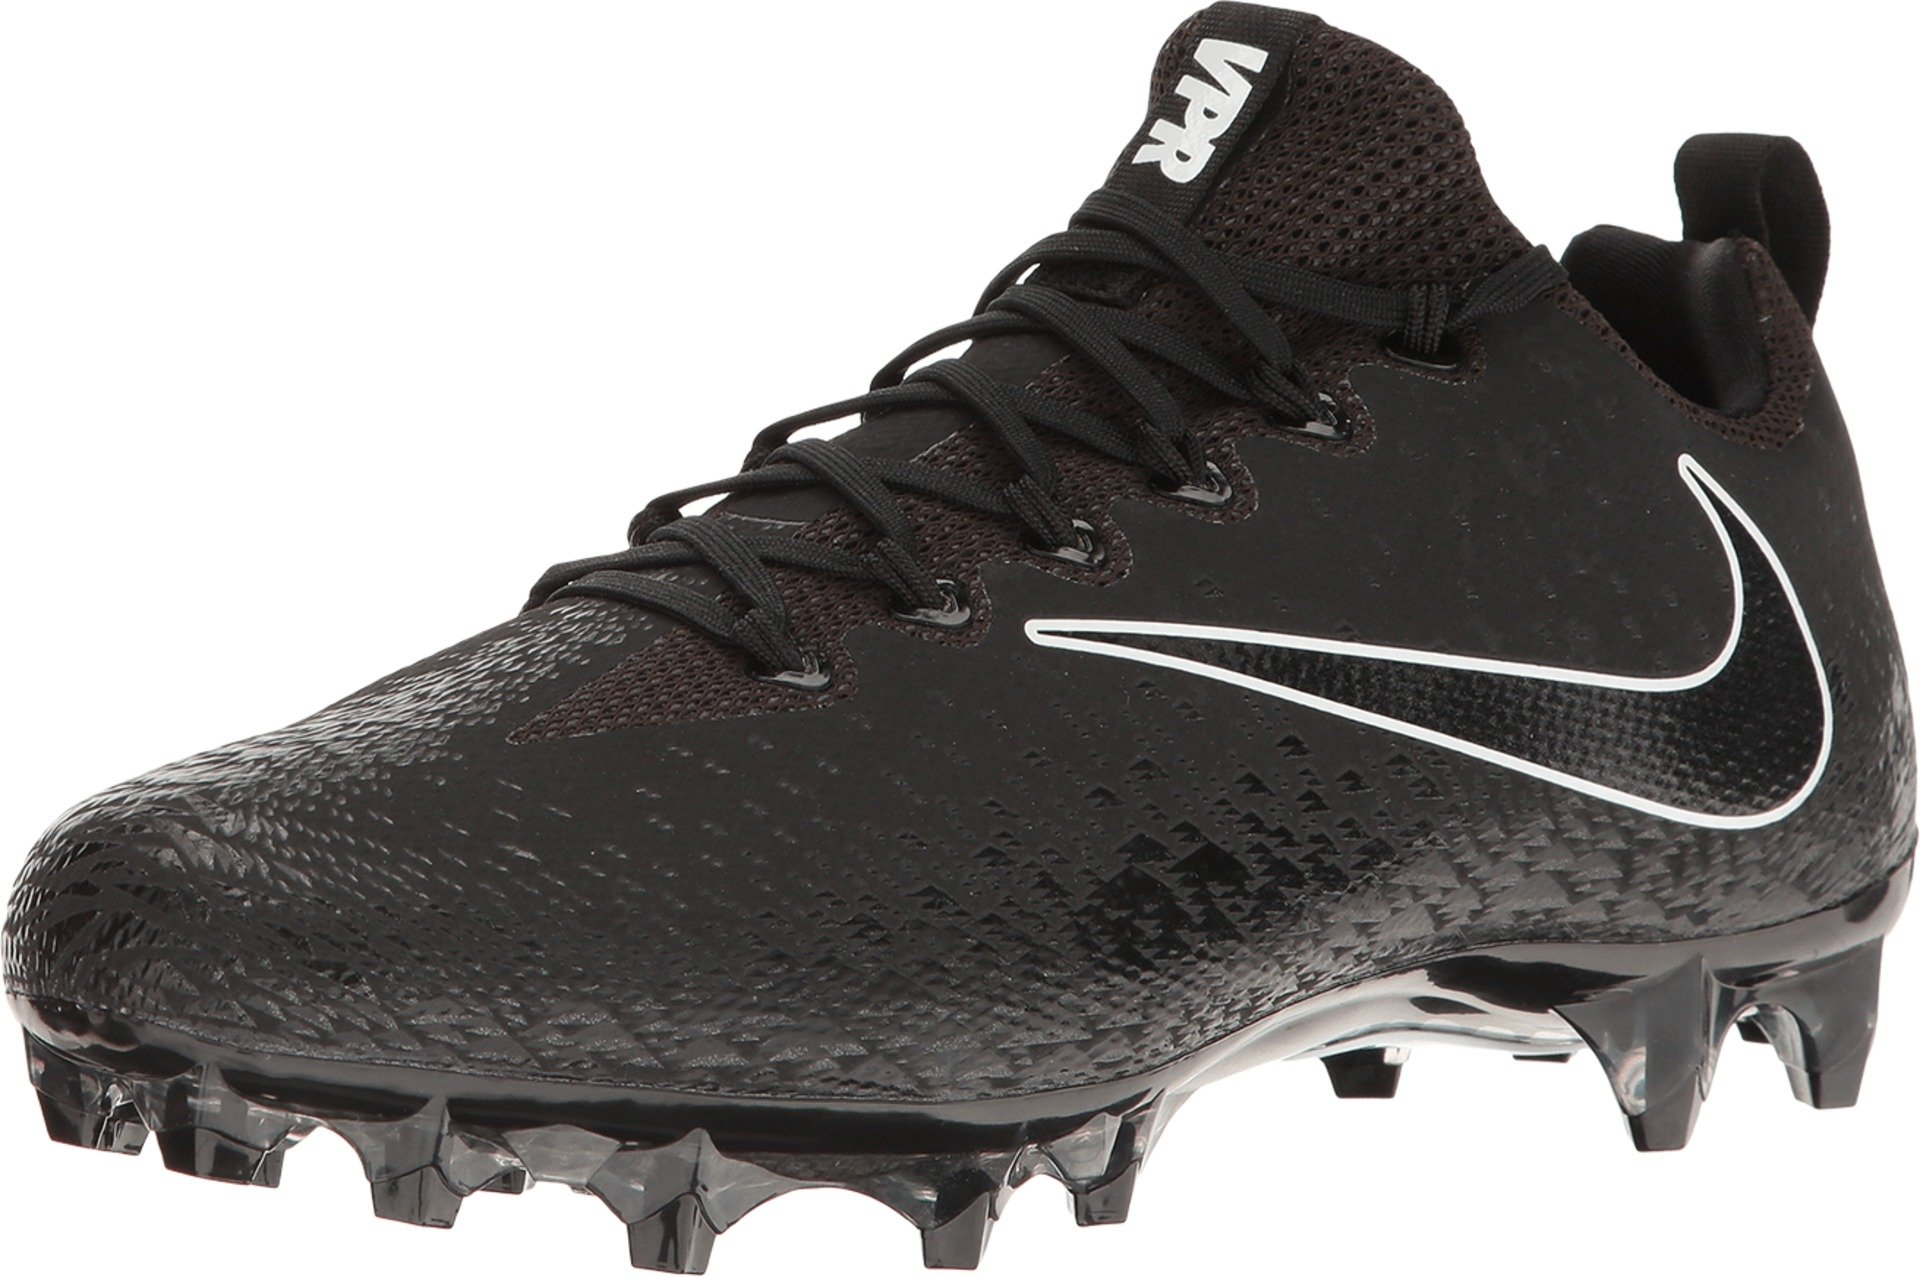 Nike Vapor Untouchable Pro Black/Black/Metallic Silver/White Men's Cleated Shoes